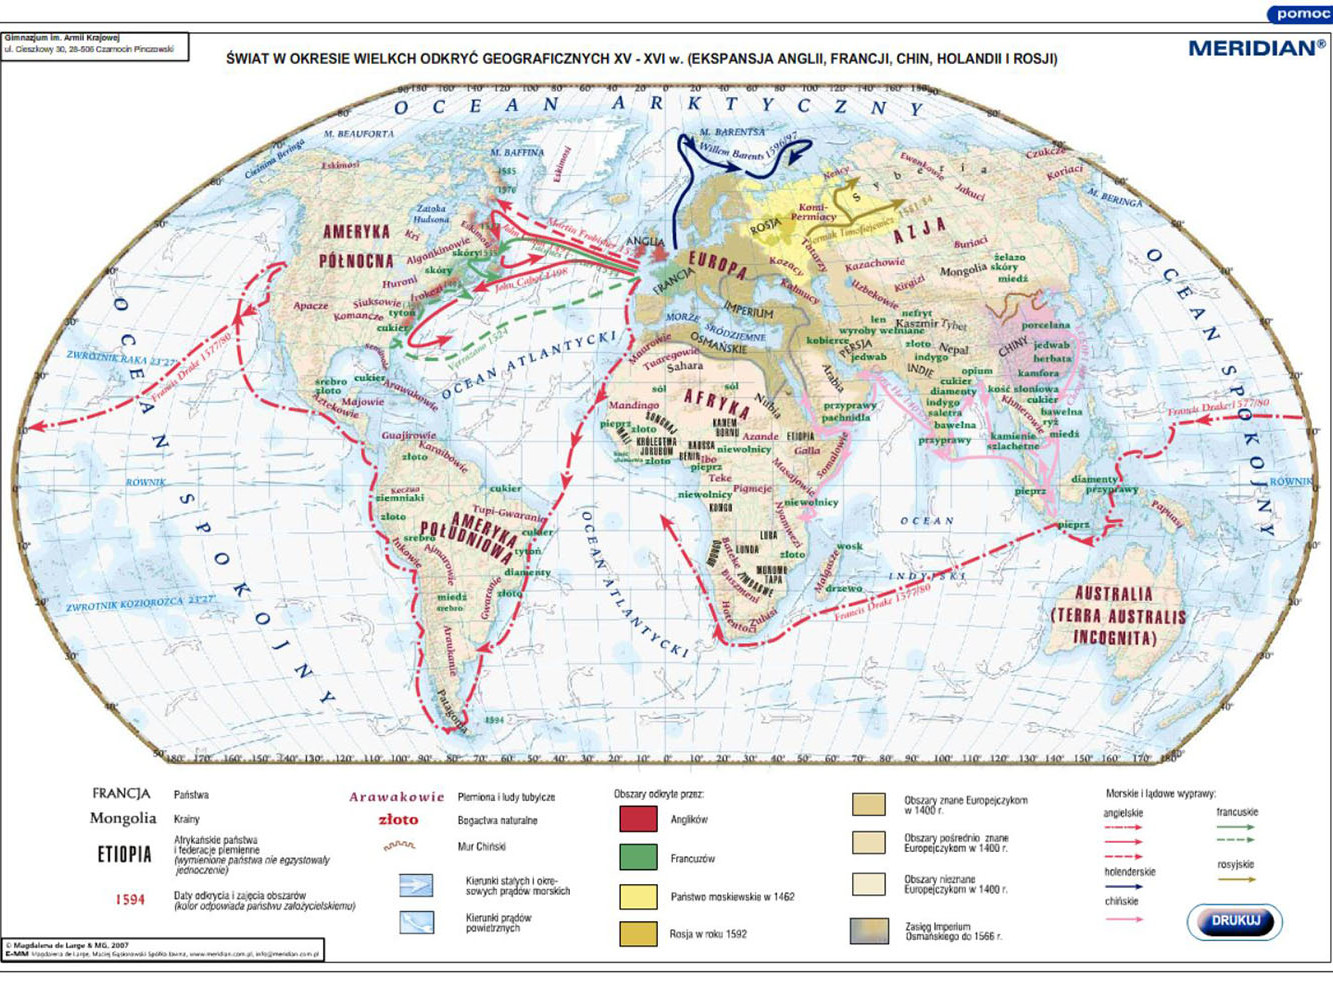 Ekspansja Anglii Francji Chin Holandii i Rosji